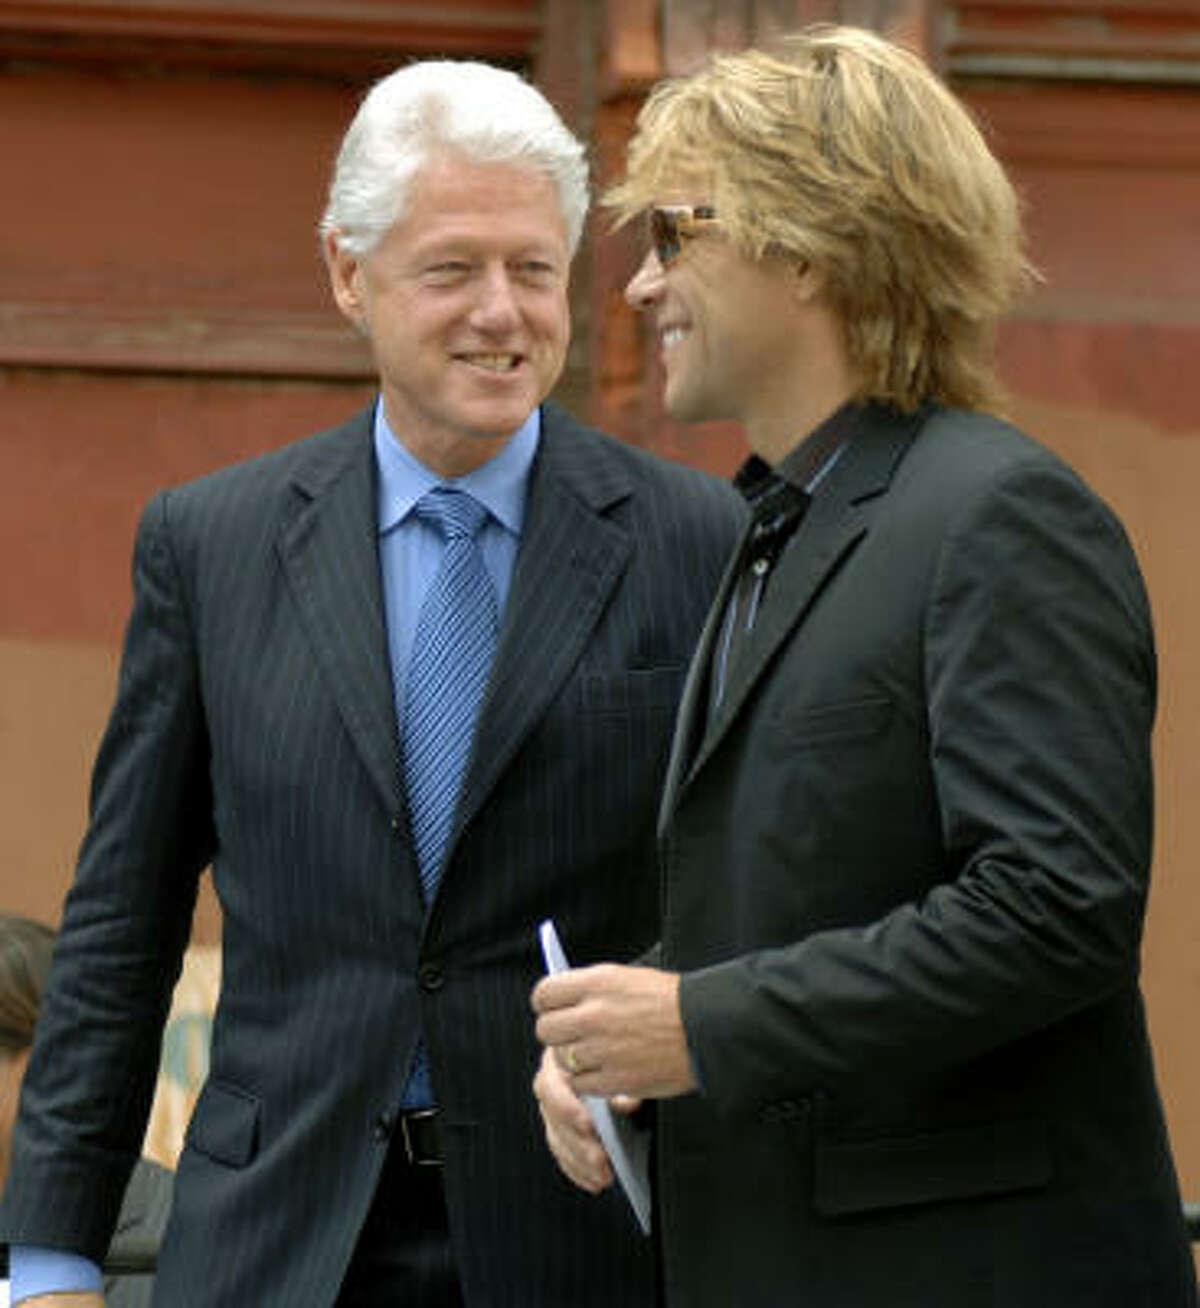 Former President Clinton, left, joins Jon Bon Jovi as the musician announces the program.